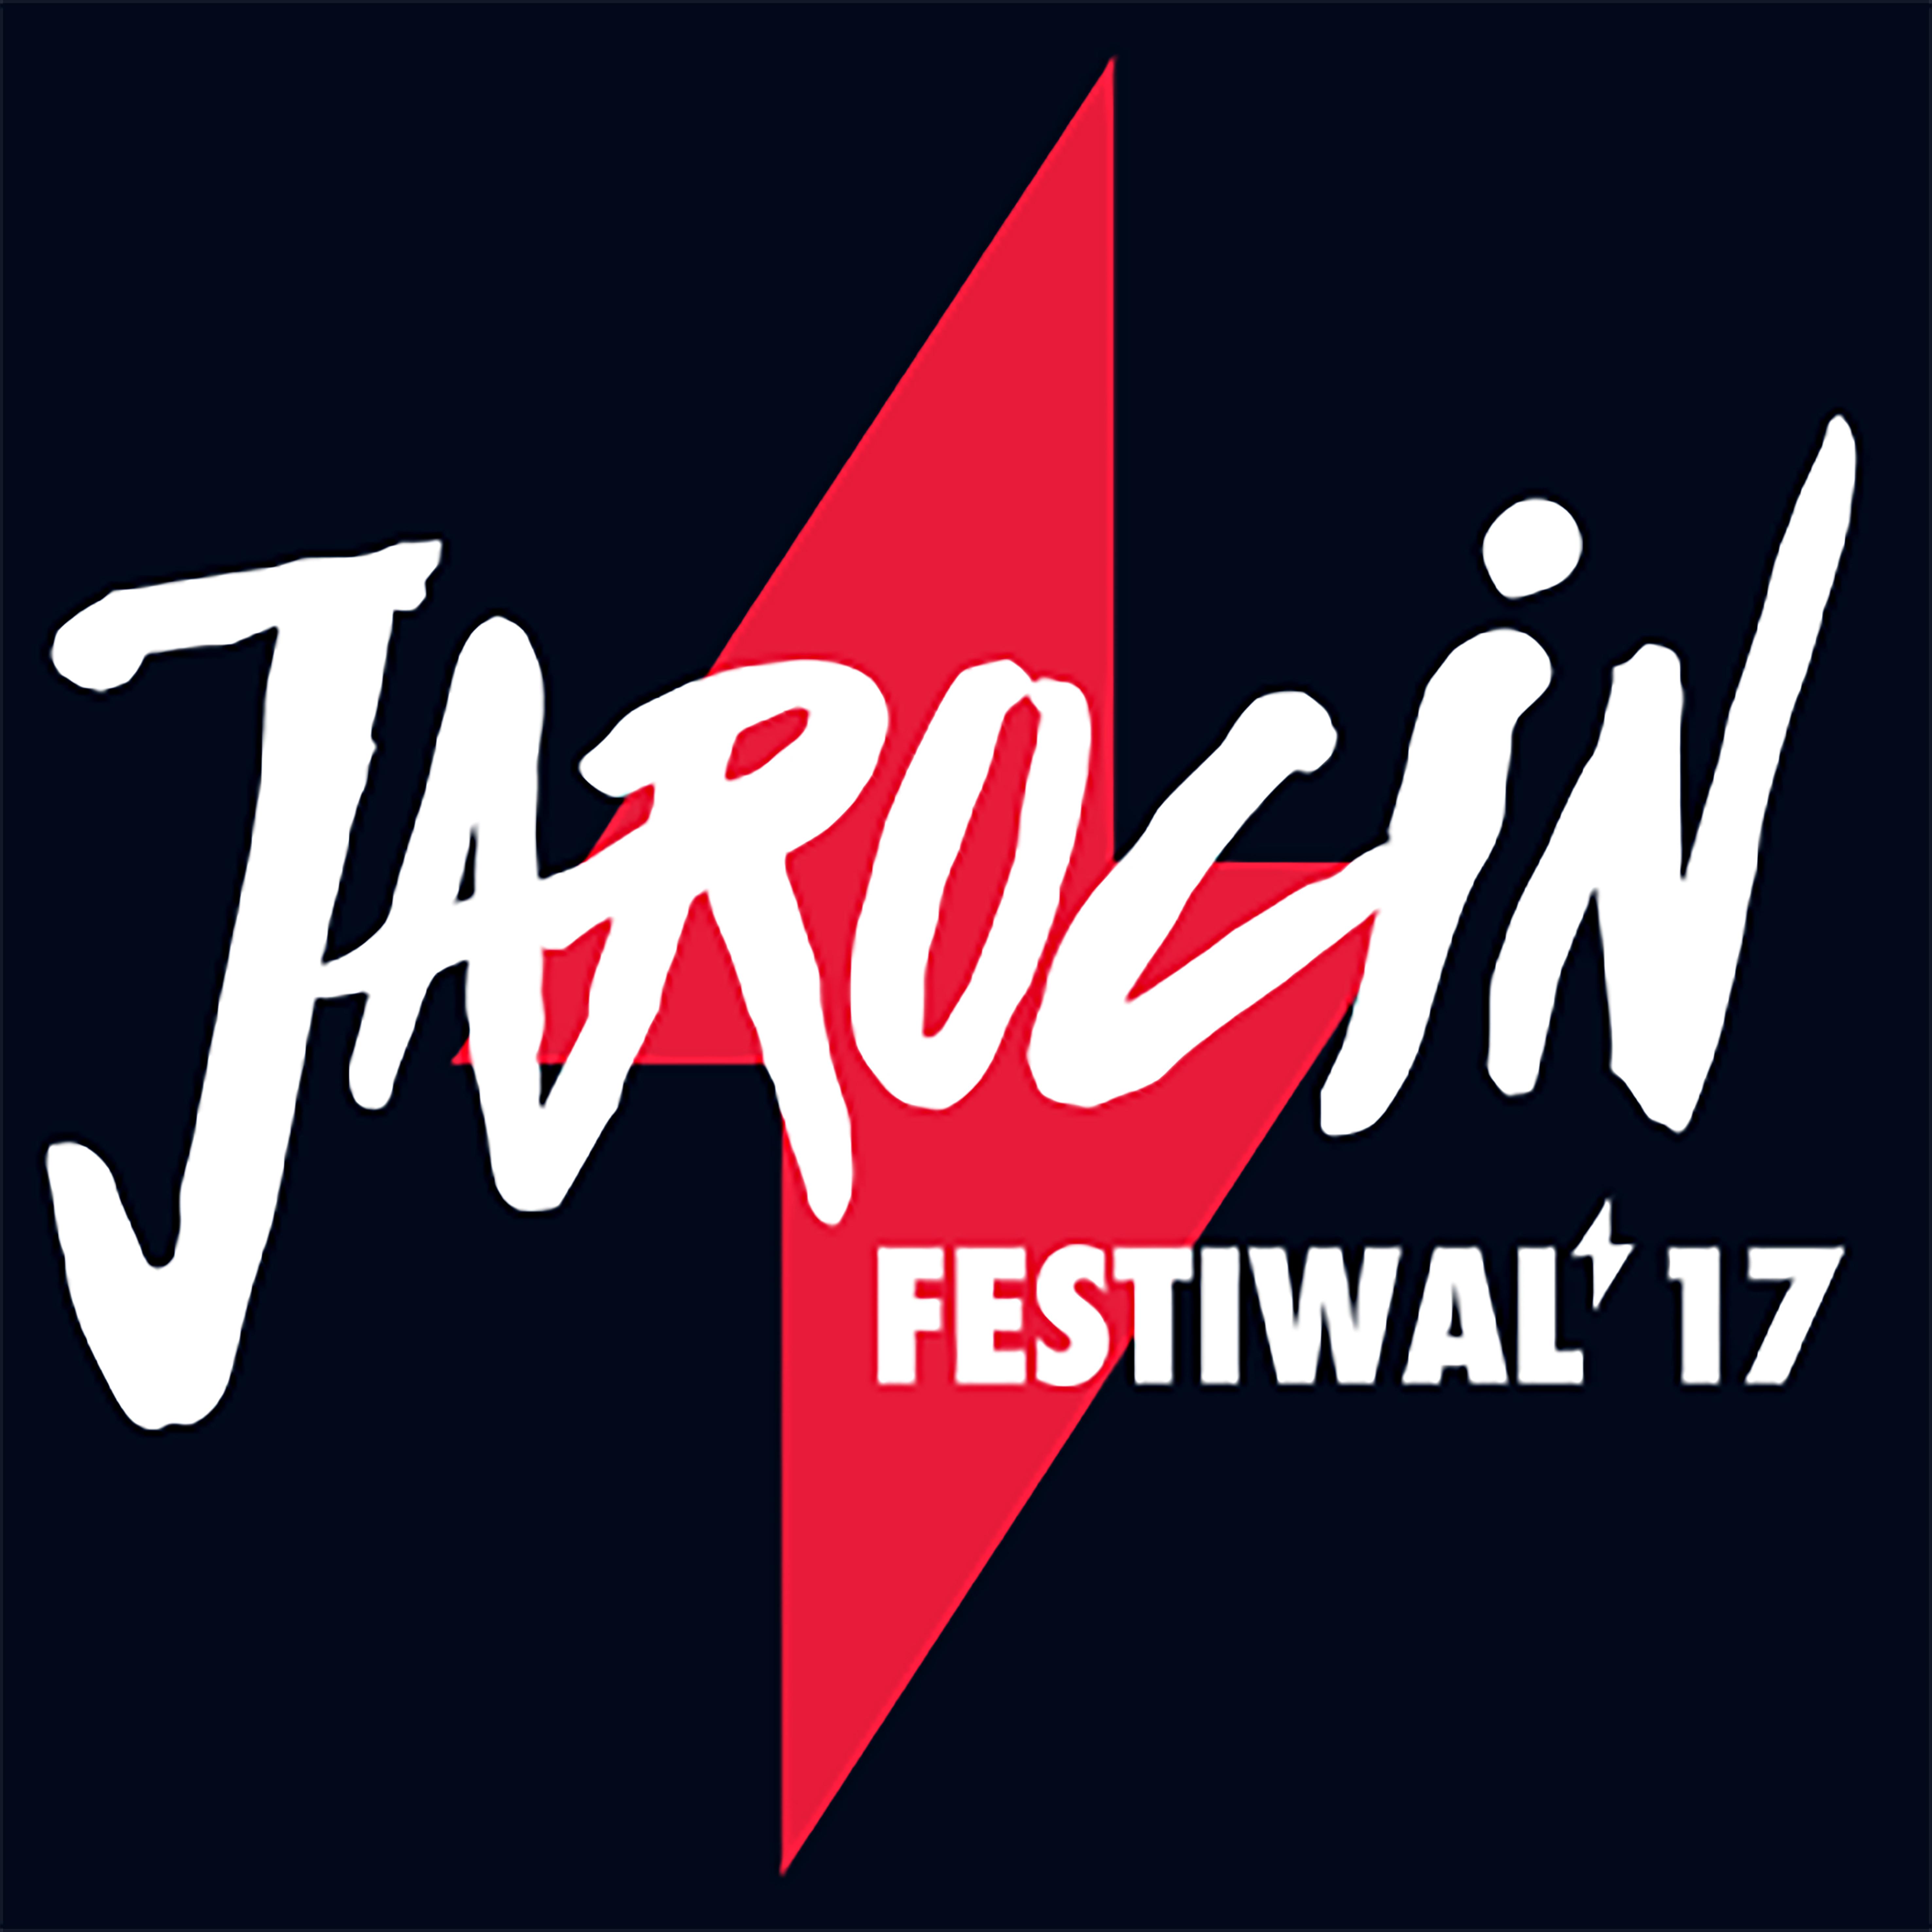 Kolejne ogłoszenia Jarocin Festiwal 2017!